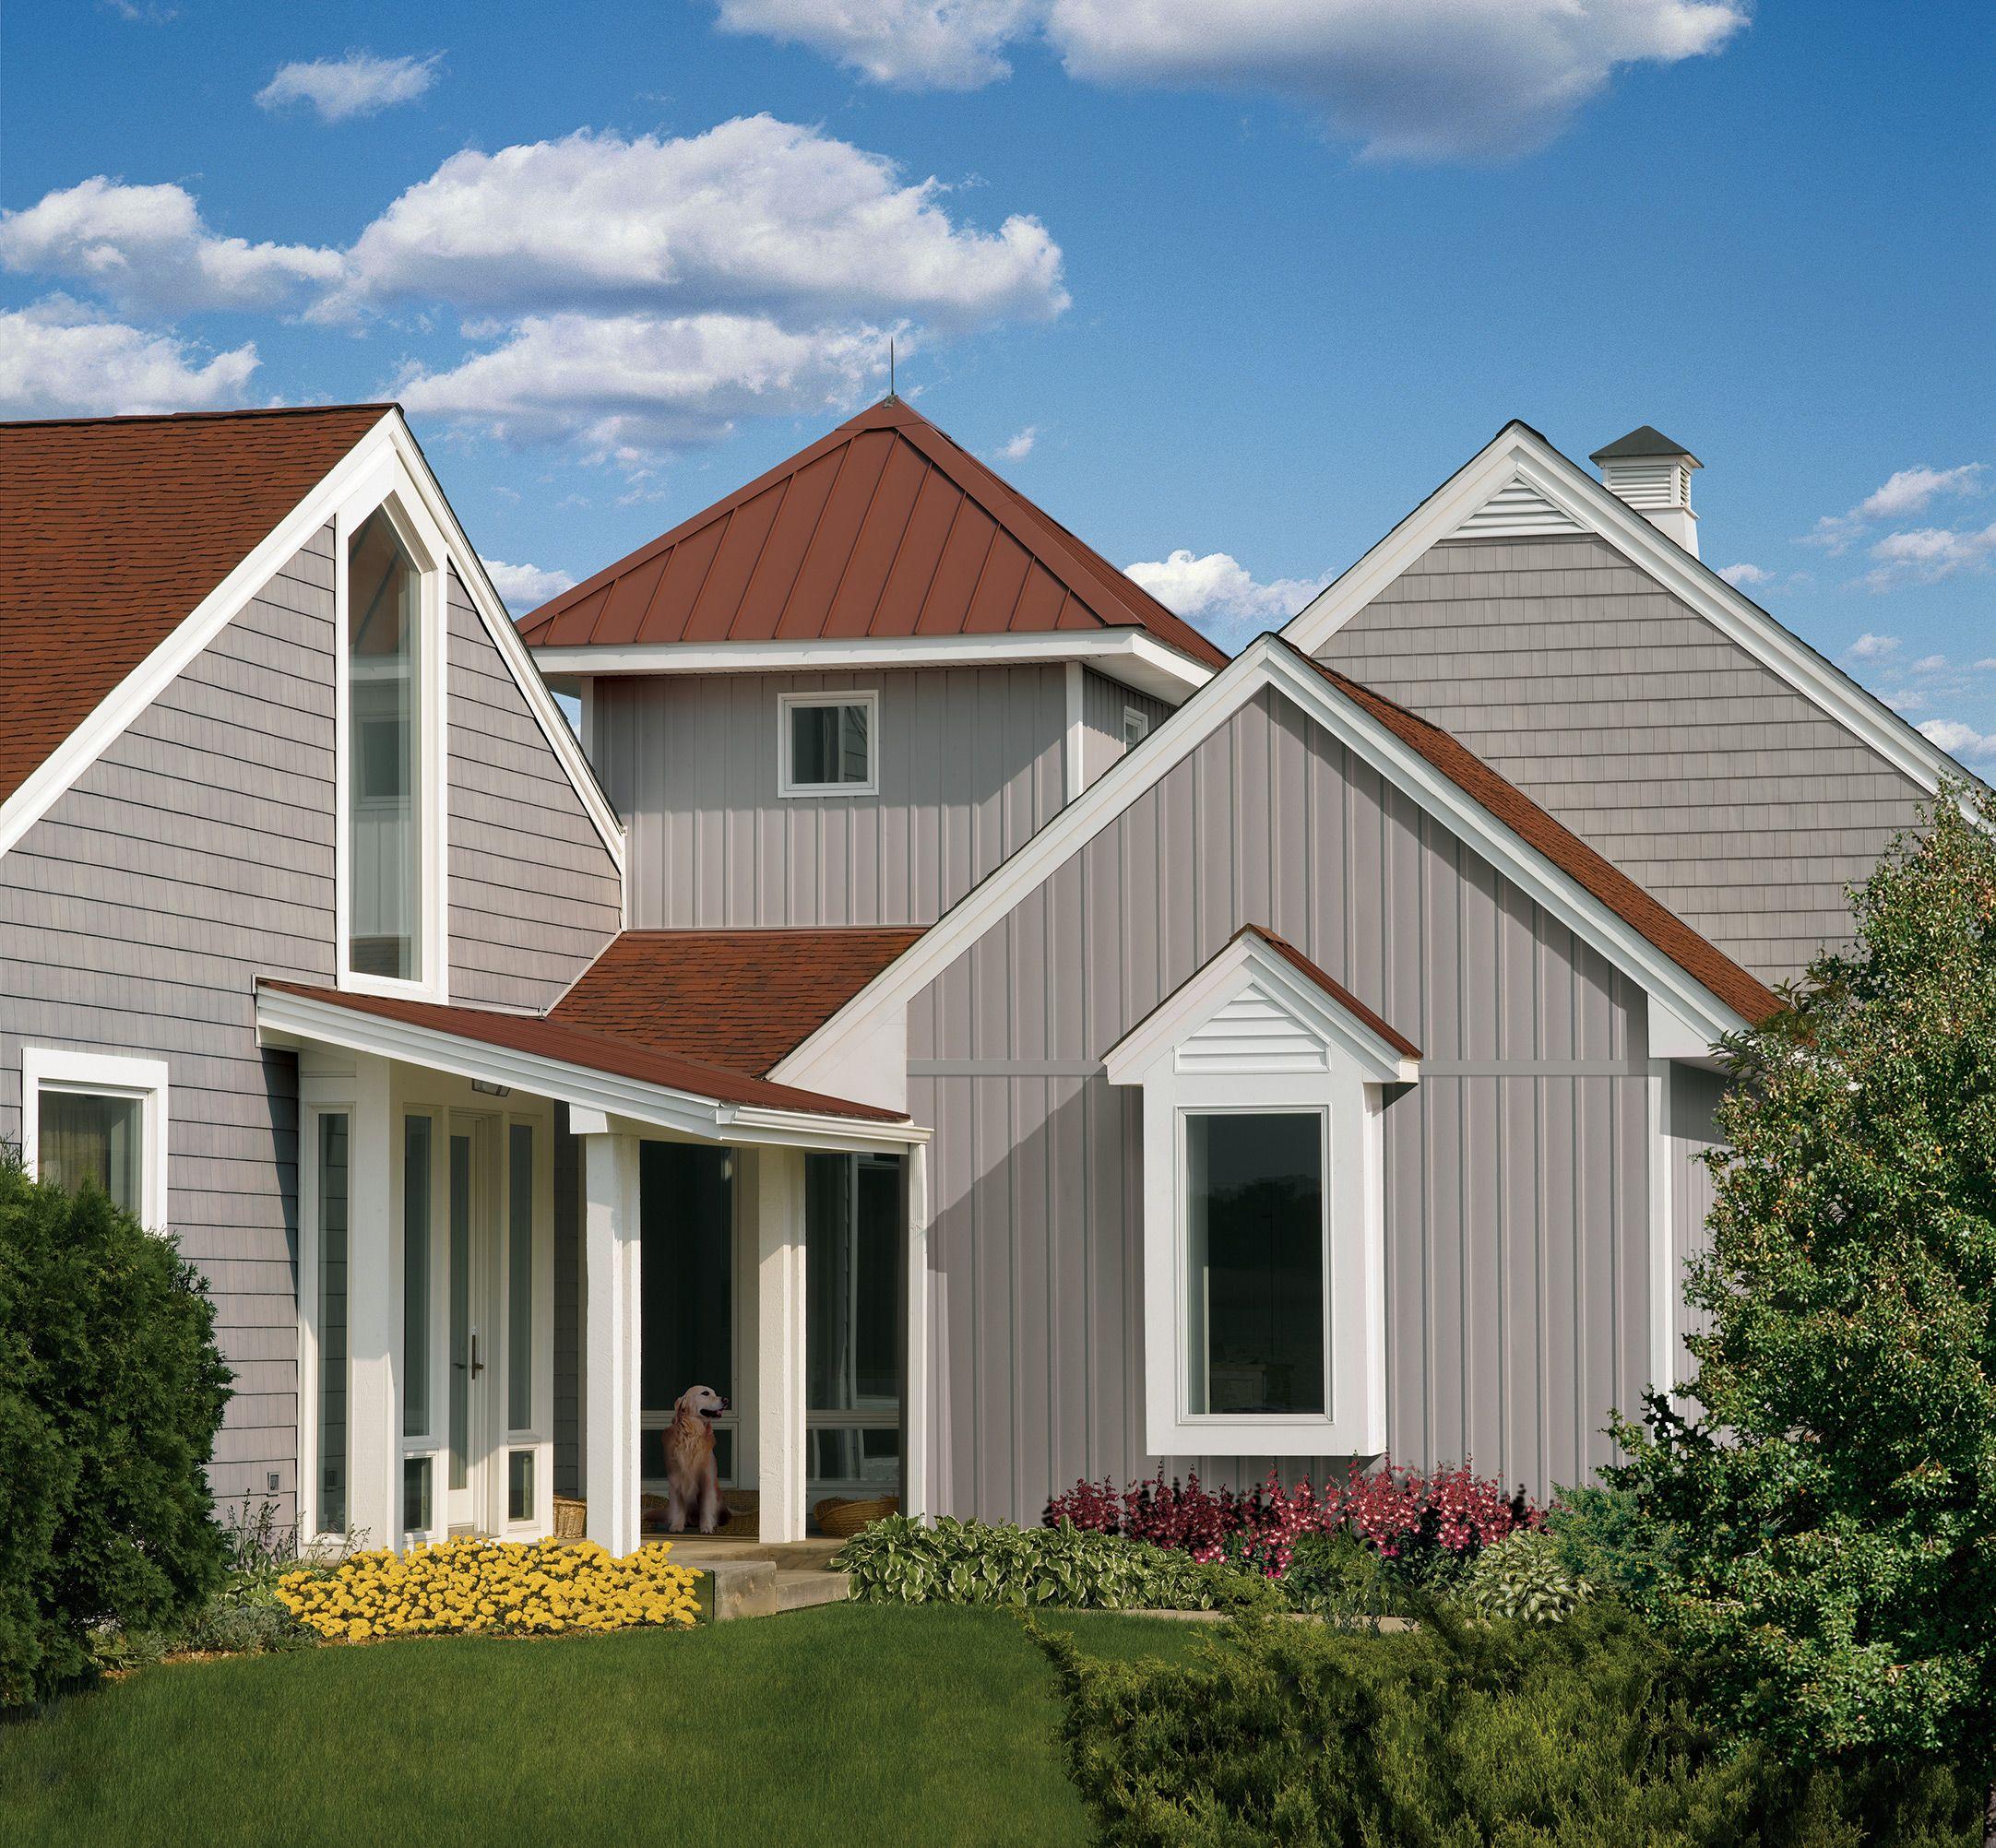 Red roof, siding color, white trim Modern: Shake - Vinyl ... on Modern Vinyl Siding Ideas  id=26000